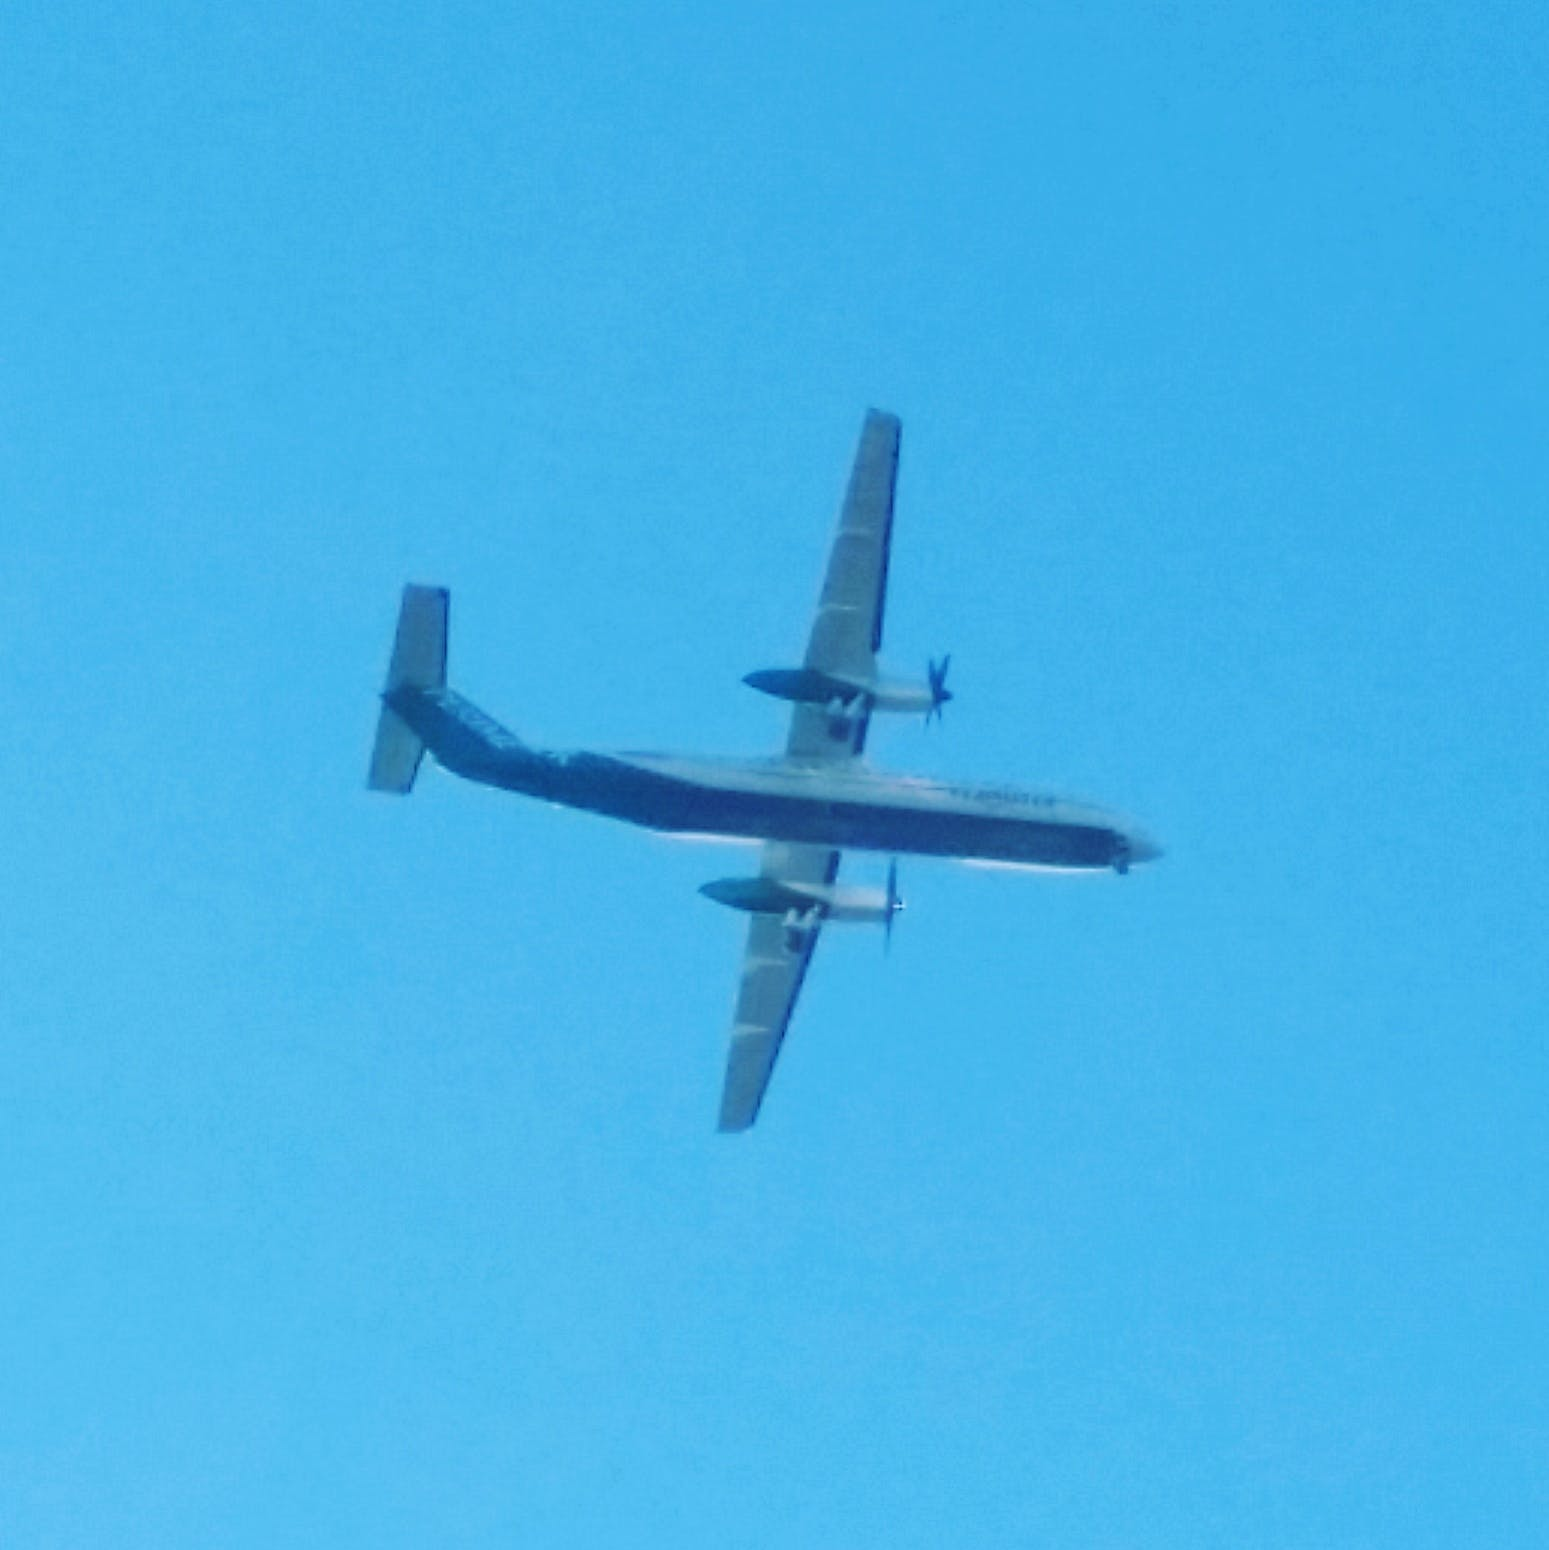 Free stock photo of aeroplane, aerospace, aircraft, blue skies